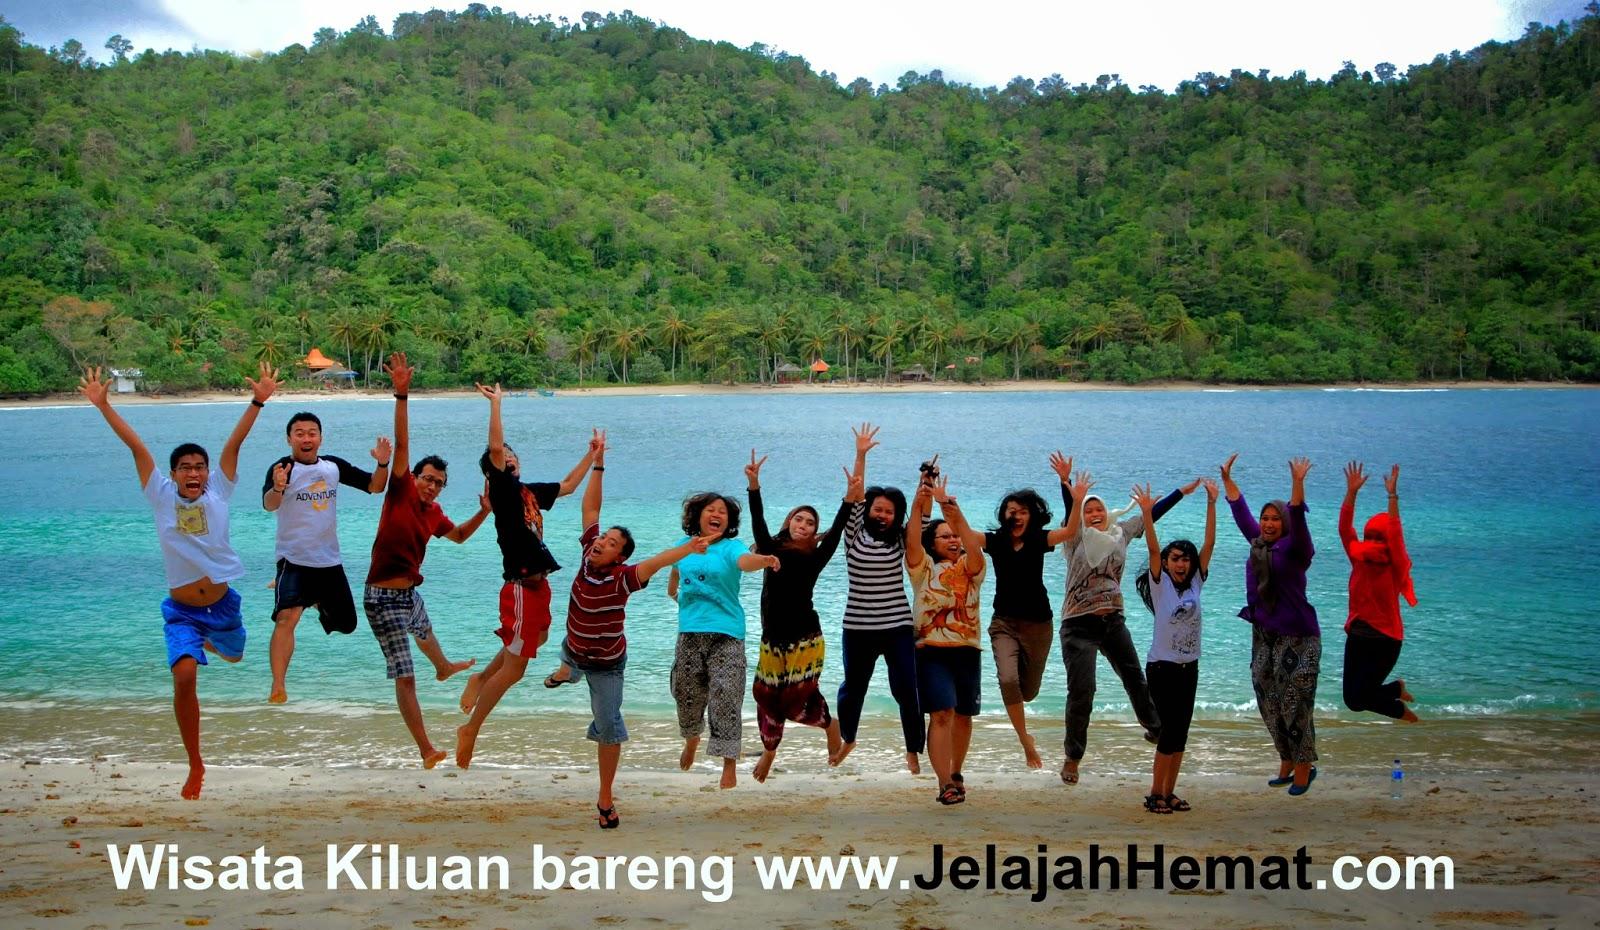 Paket Wisata & Liburan Teluk Kiluan Lampung Jelajah Hemat